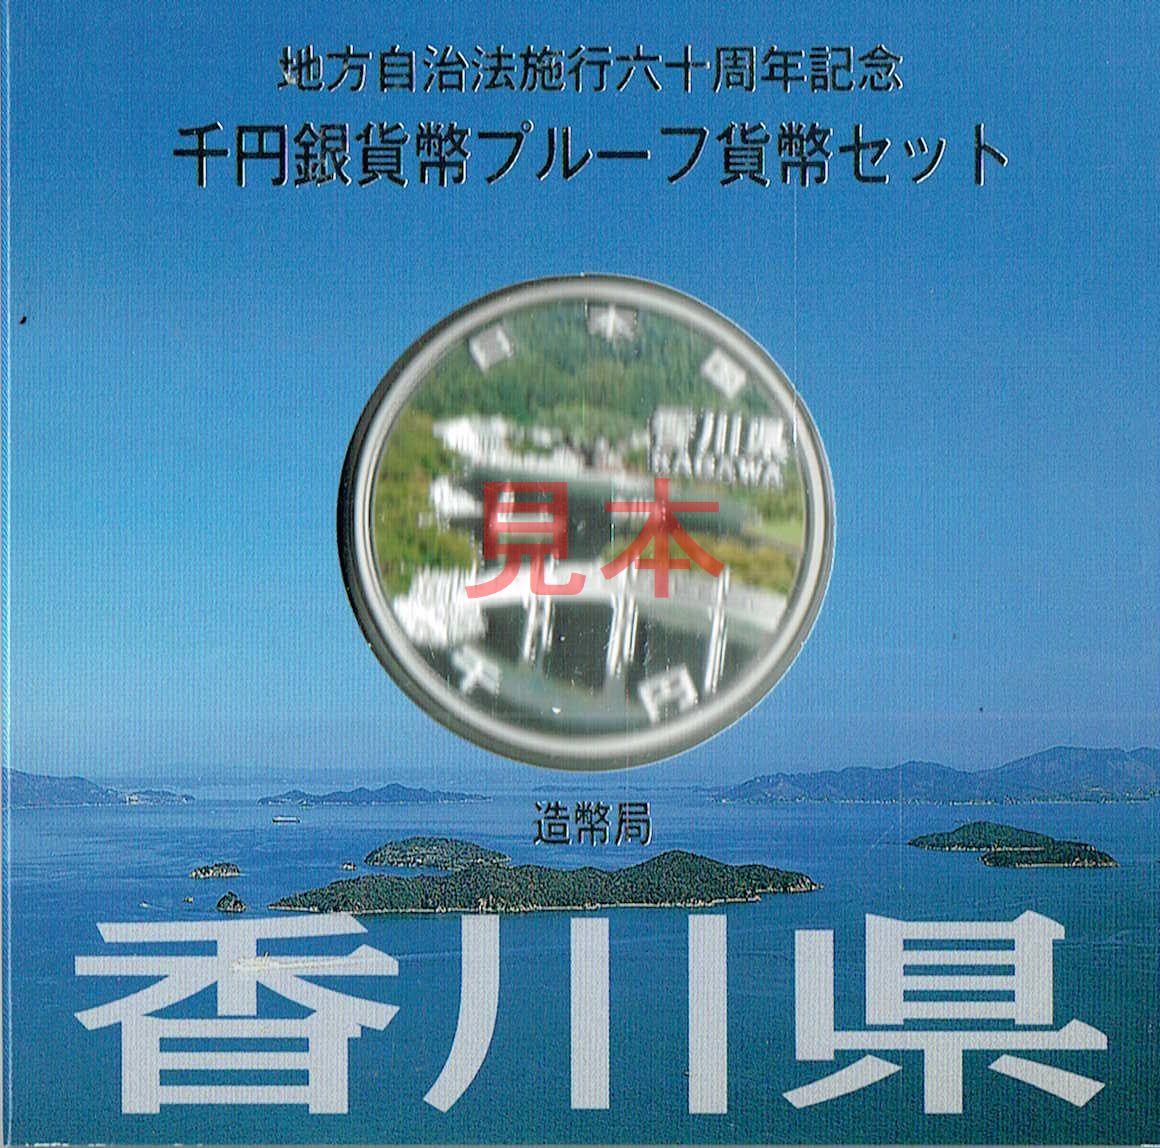 商品名「地方自治法施行60周年記念千円銀貨幣プルーフ Aセット 香川県」